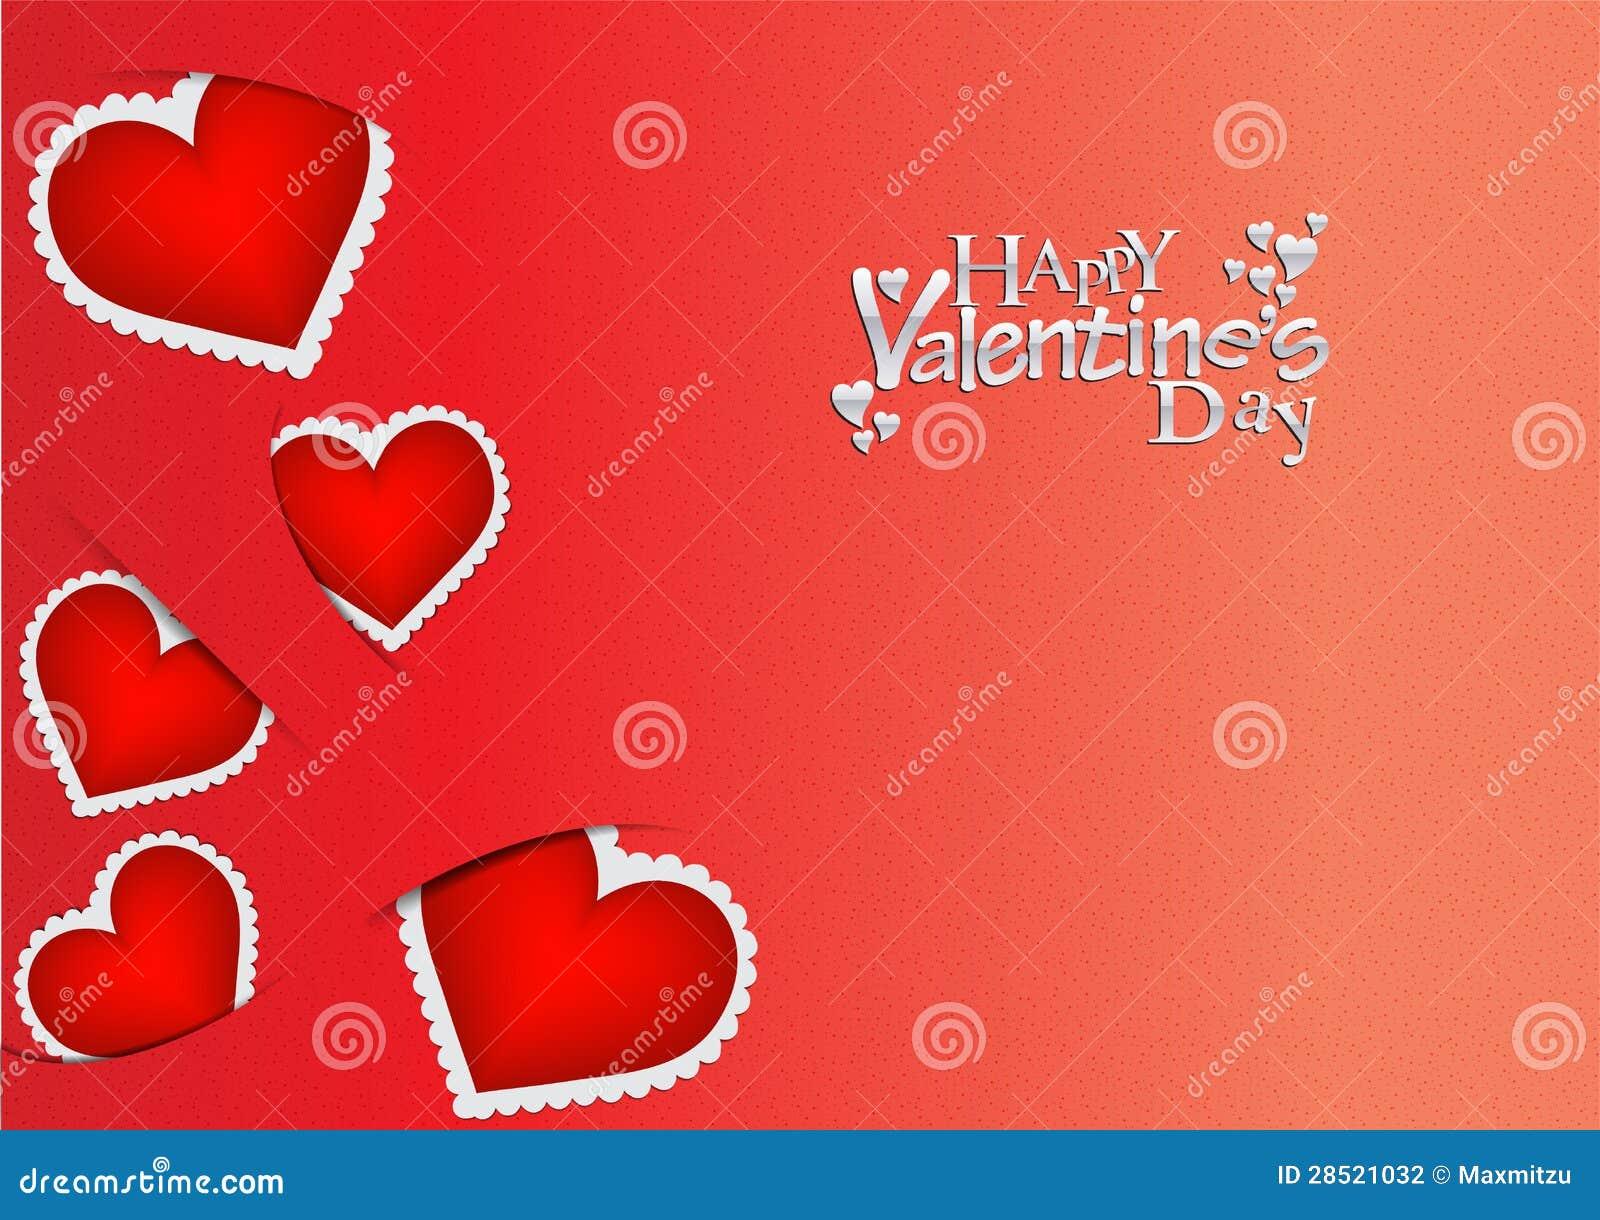 Valentines Day Red Cardbackground Photography Image 28521032 – Valentine Card Background